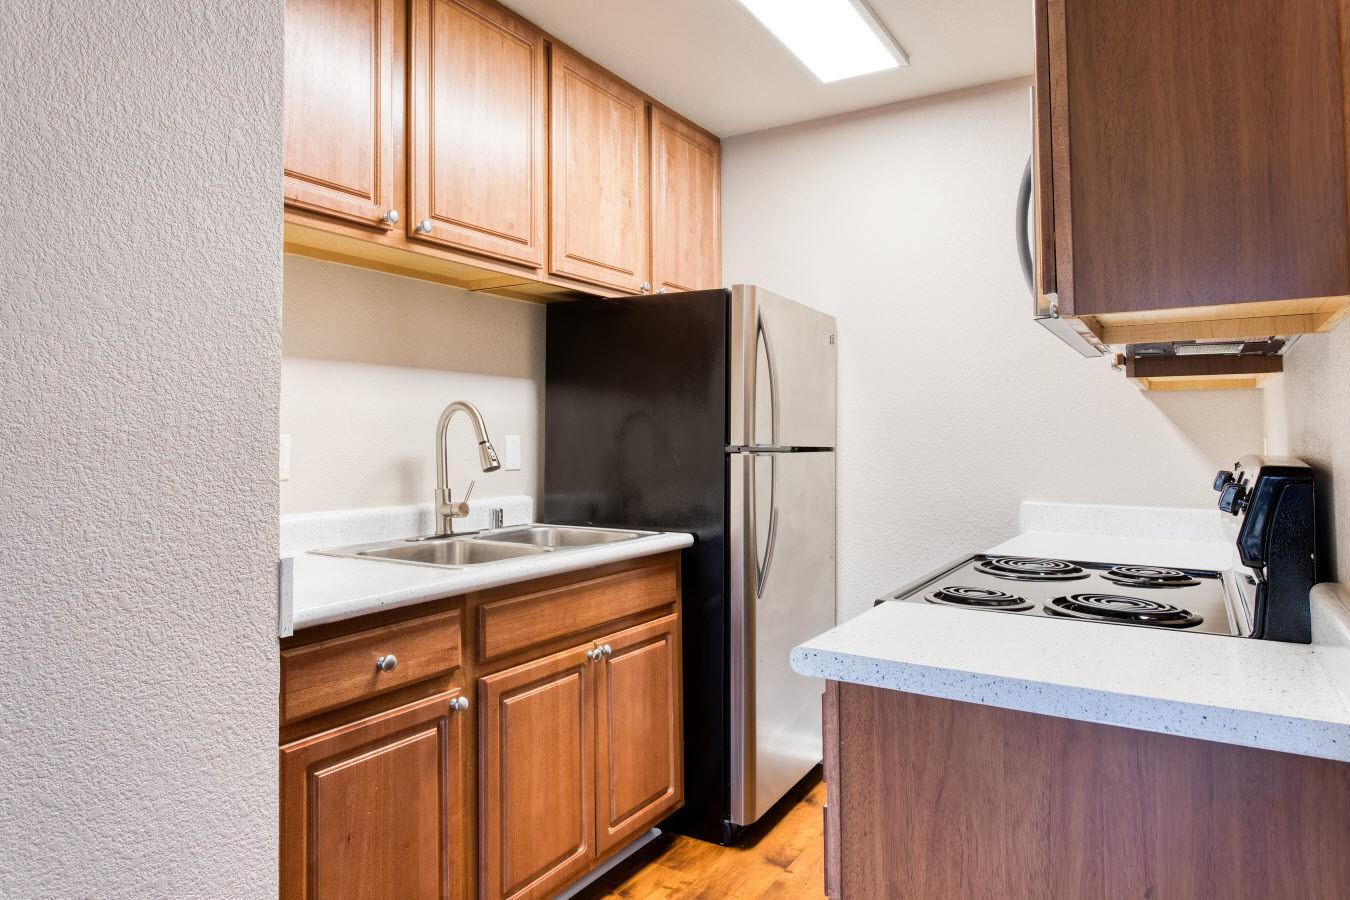 Apartments Near ITT Technical Institute-Concord IMT Pleasant Hill for ITT Technical Institute-Concord Students in Concord, CA